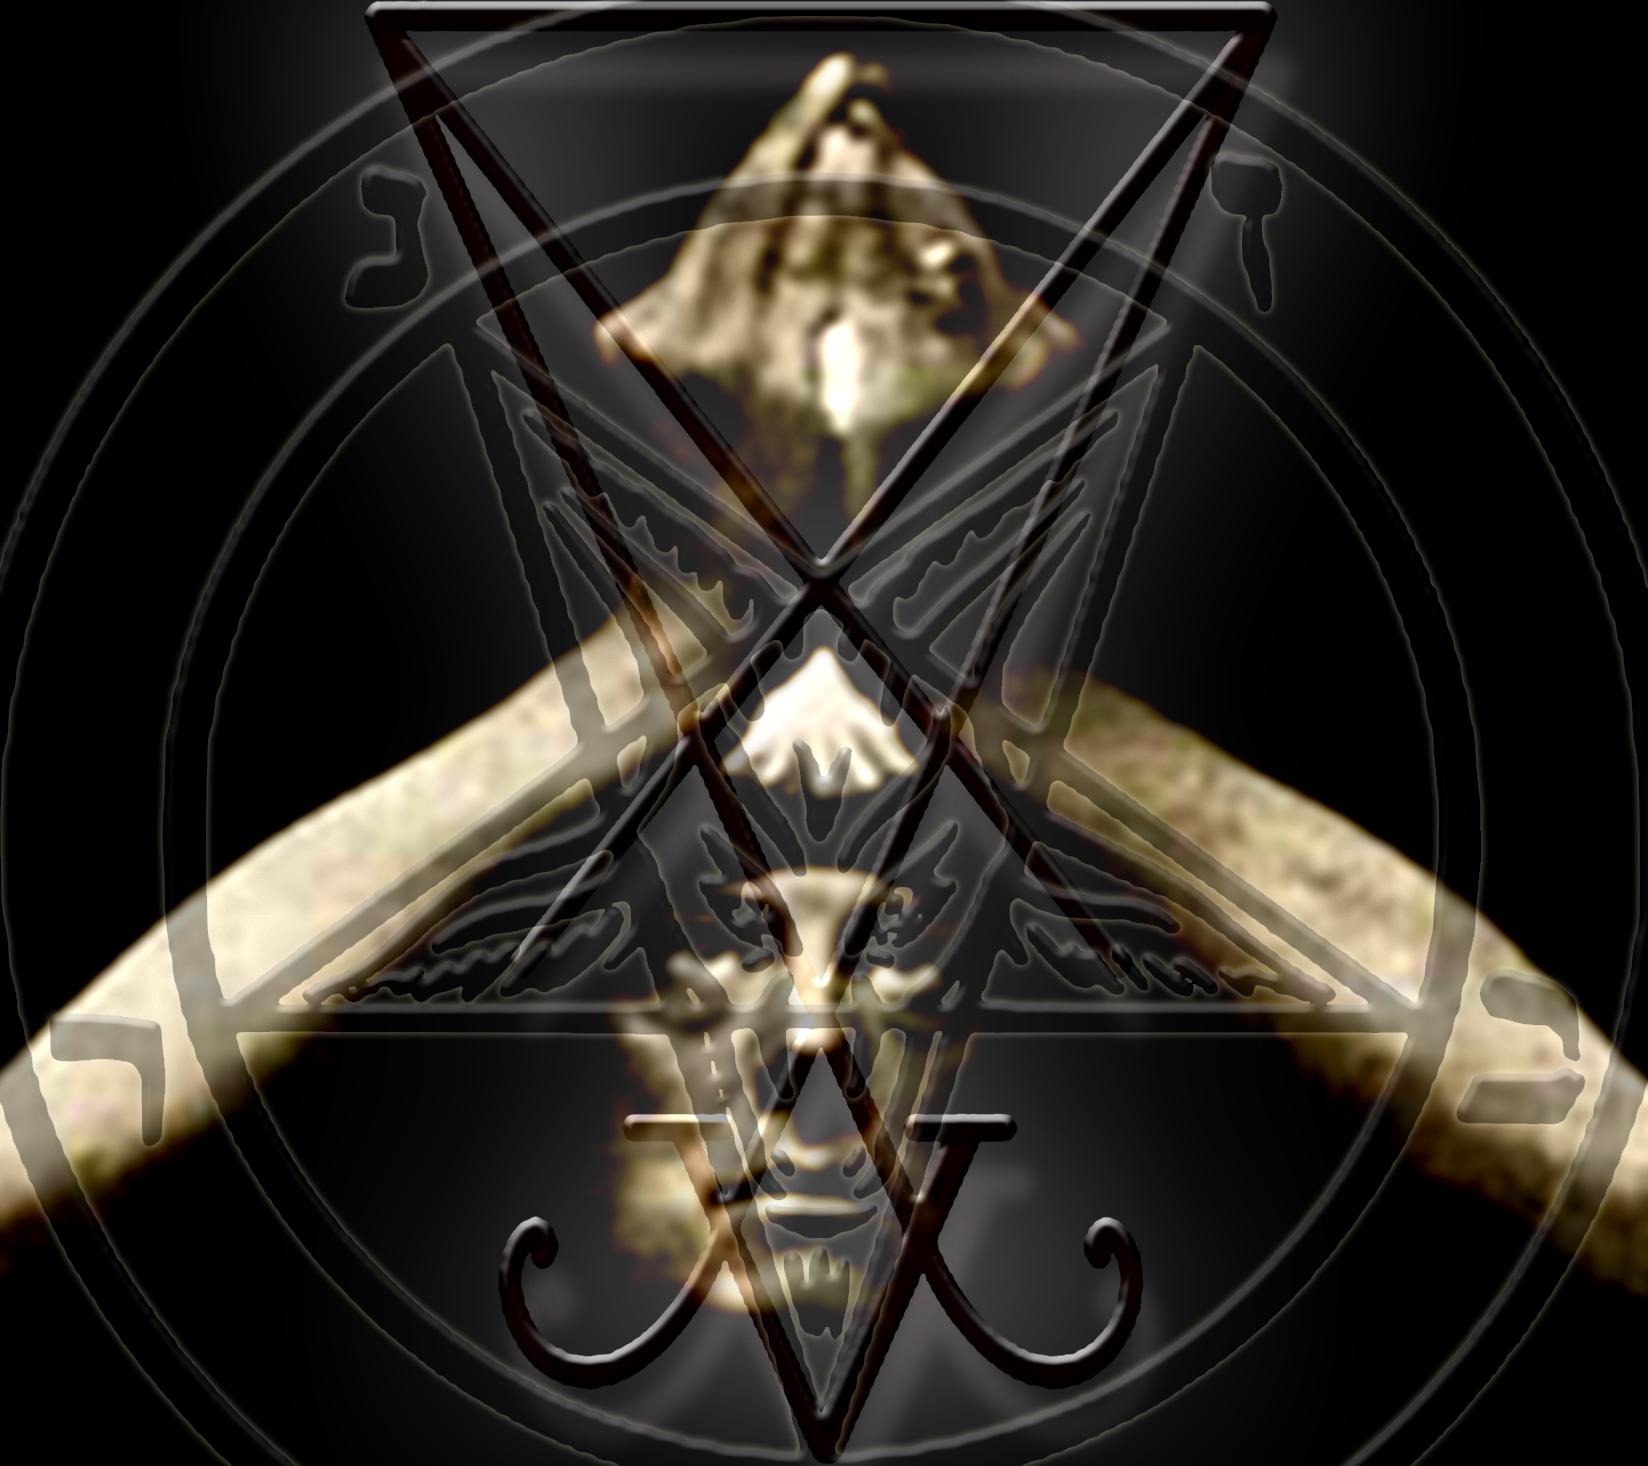 illuminati satanic rituals - photo #42